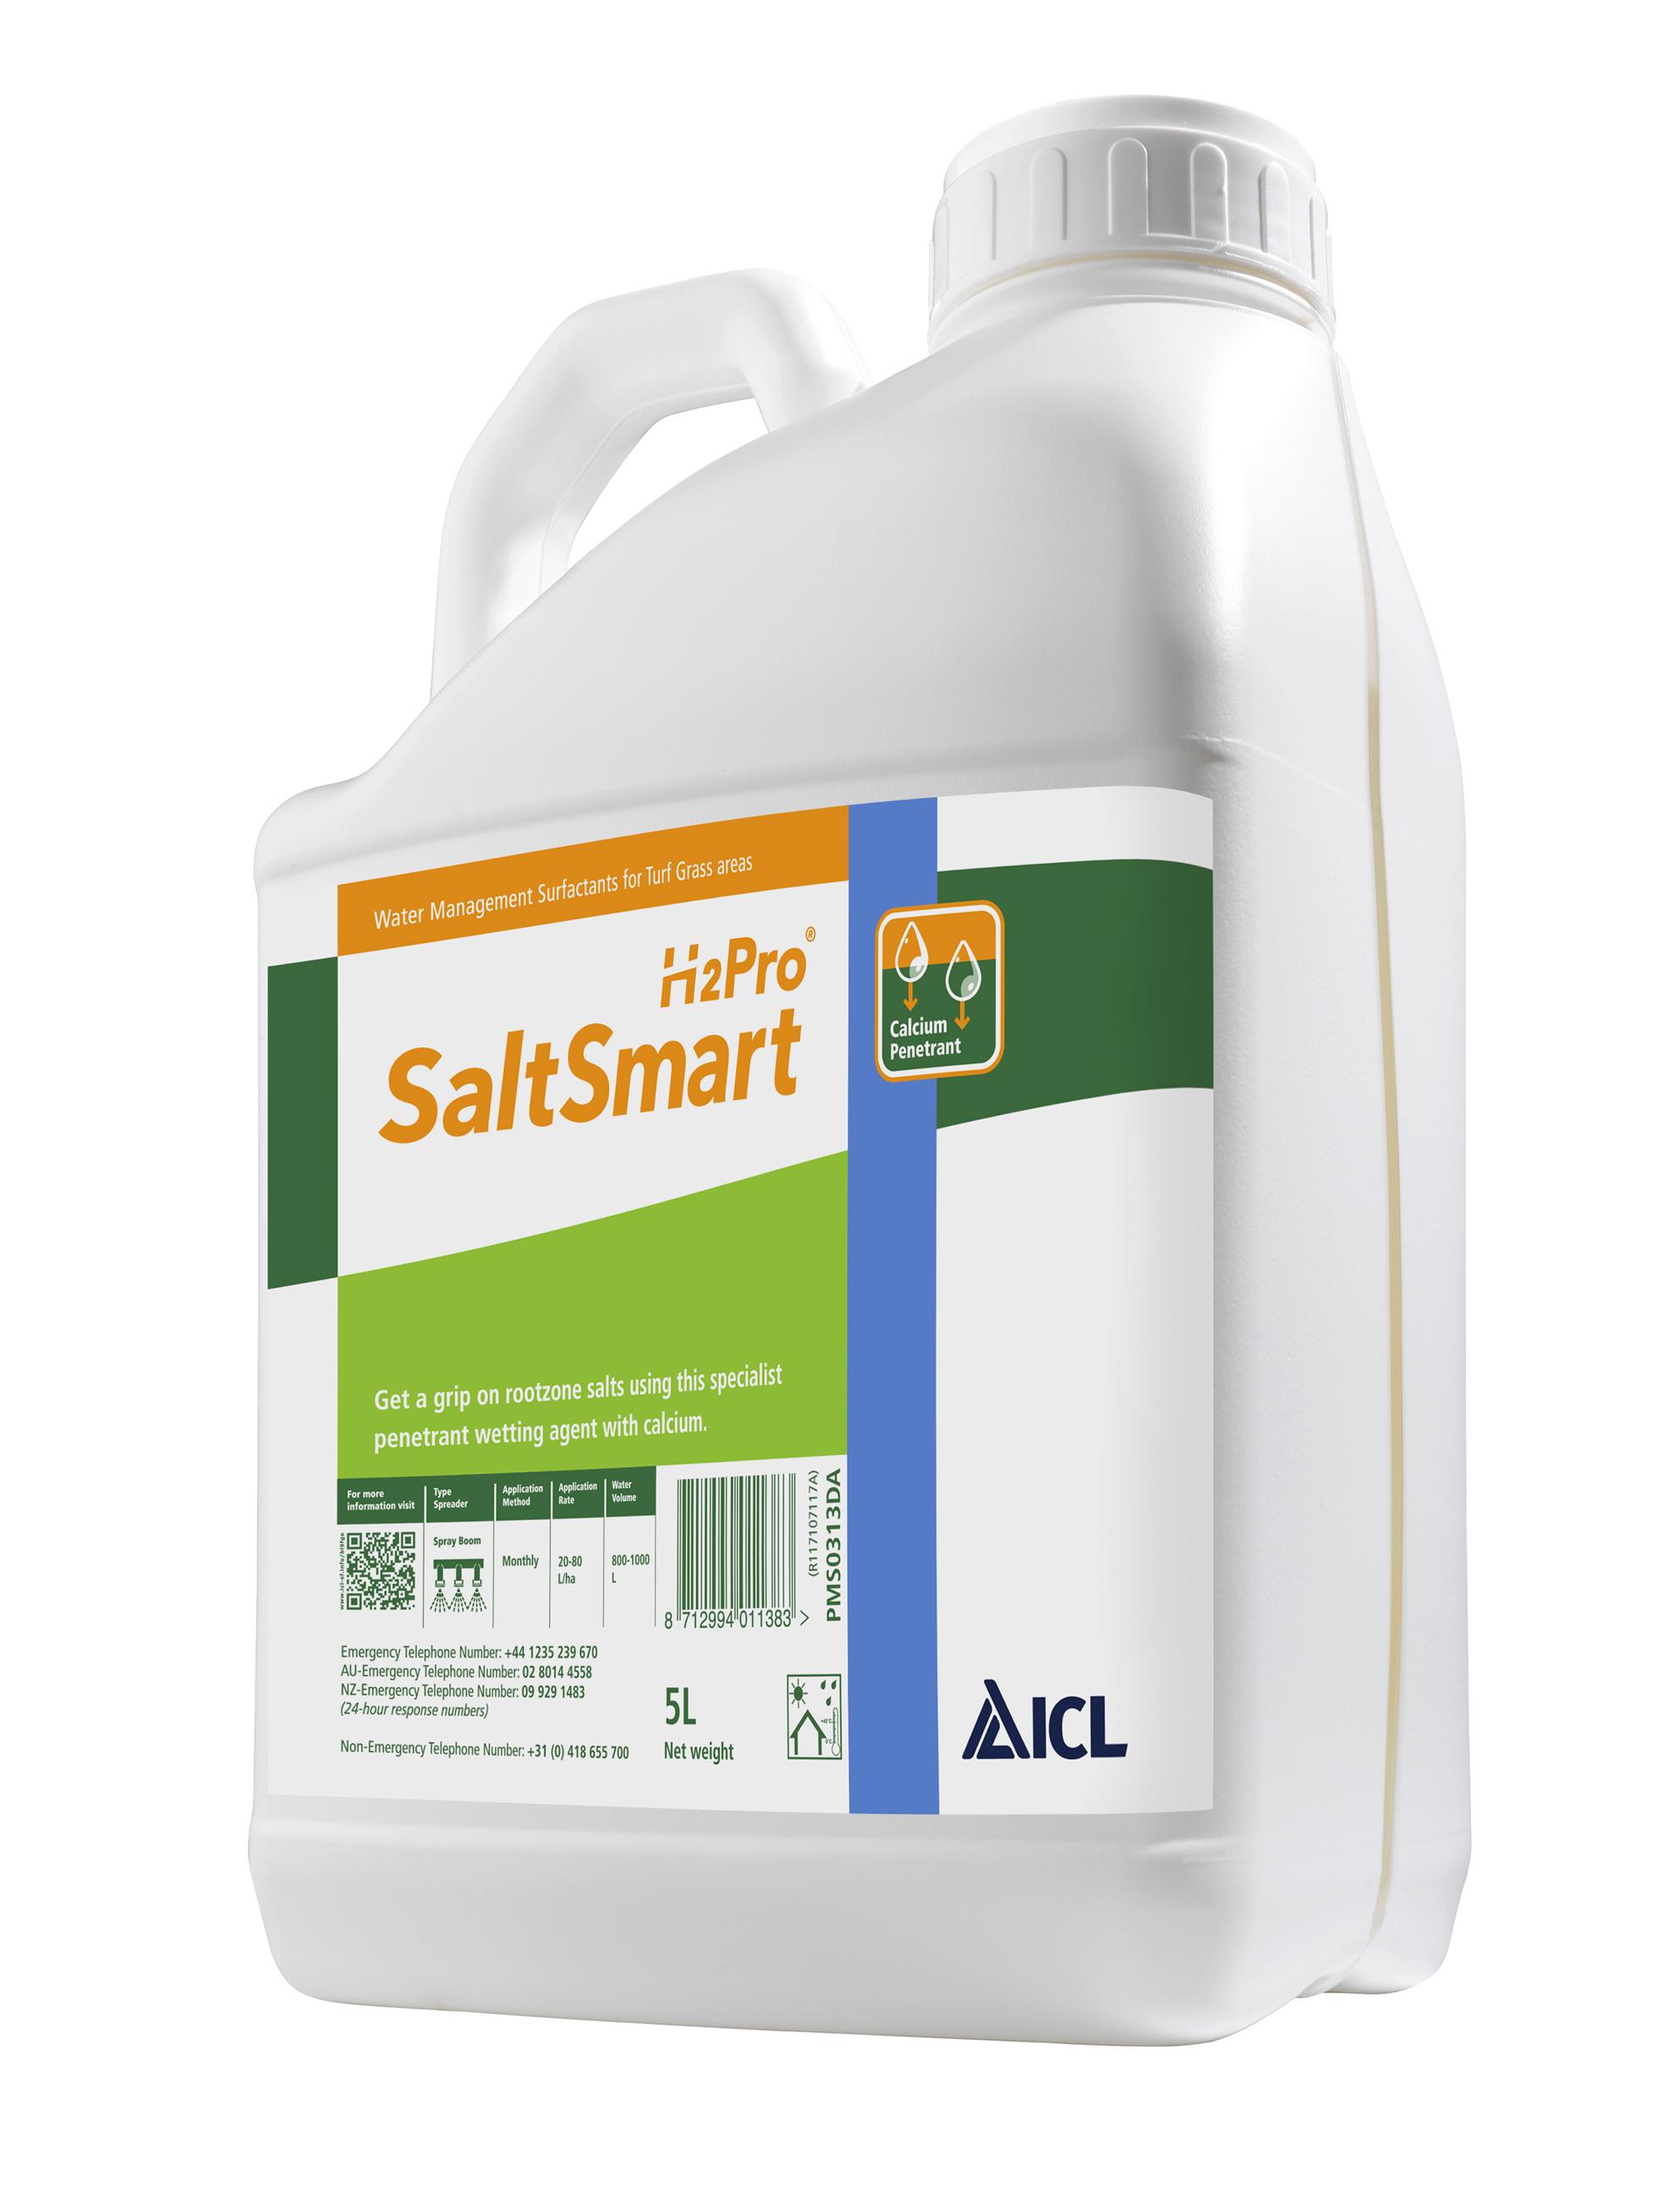 H2Pro SaltSmart